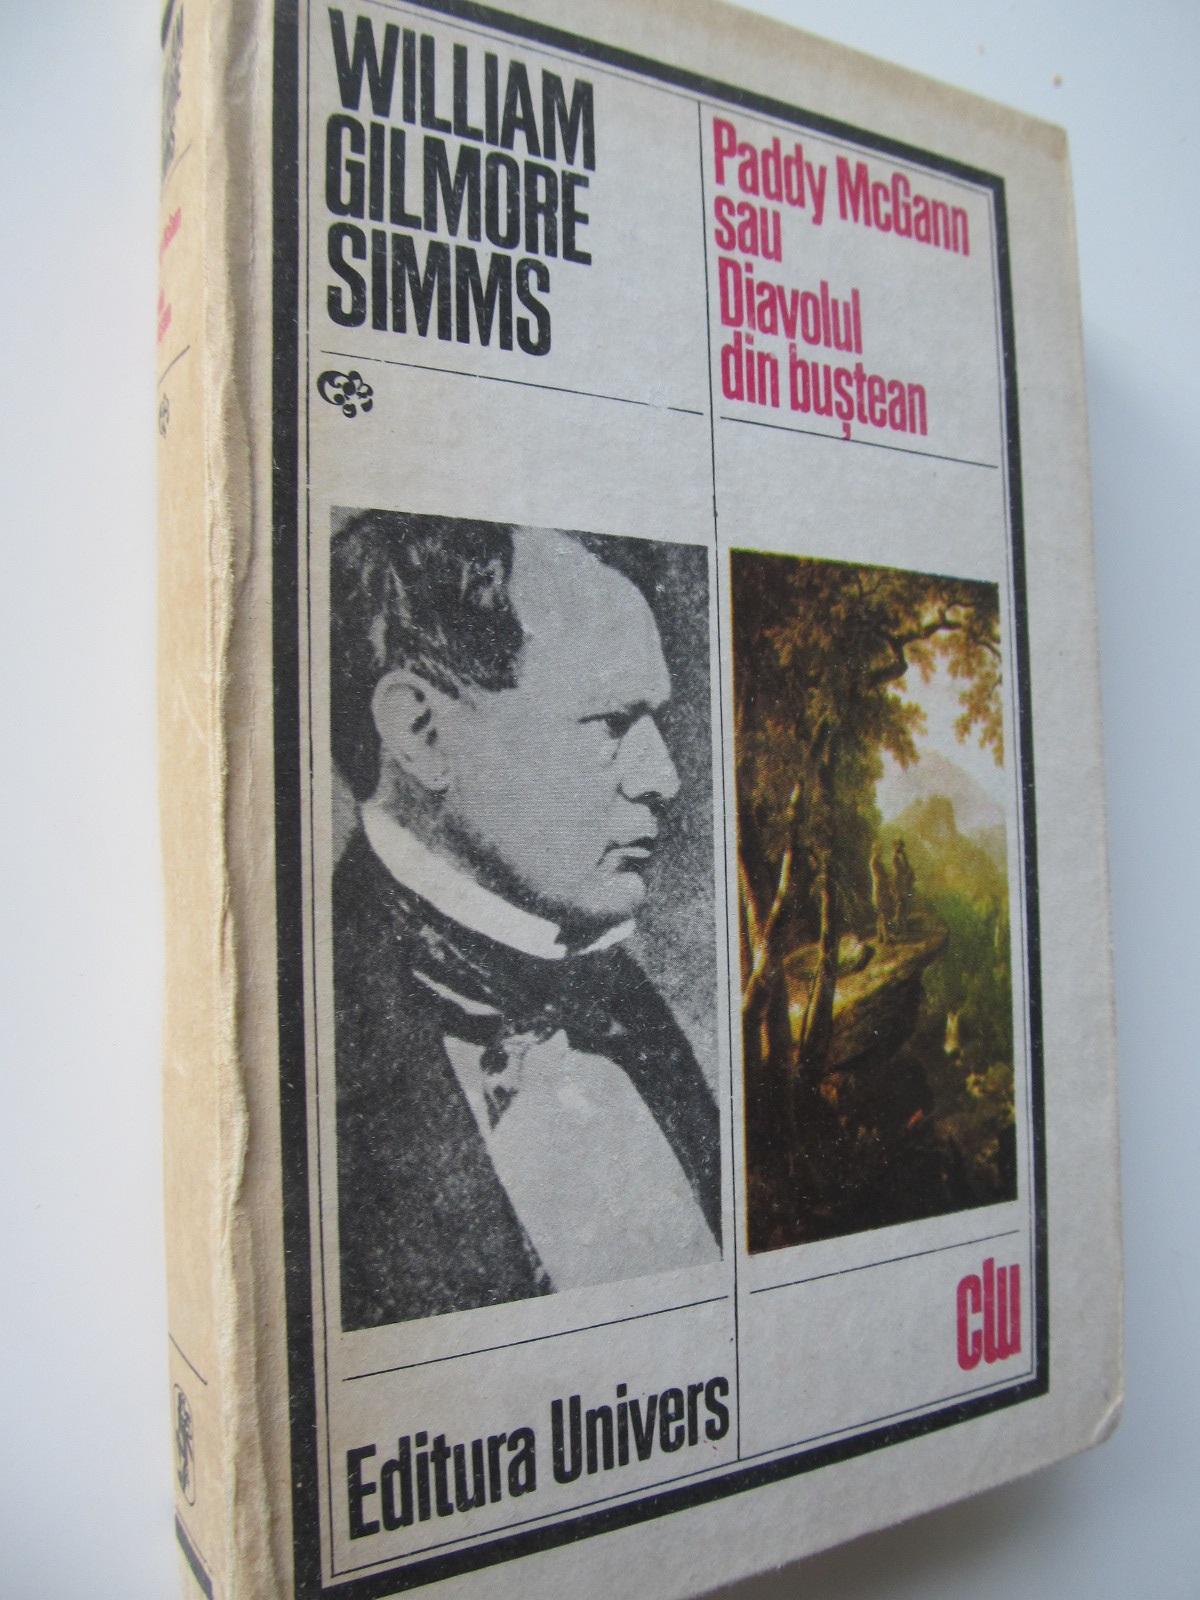 Paddy McGann sau diavolul din bustean - William Gilmore Simms | Detalii carte